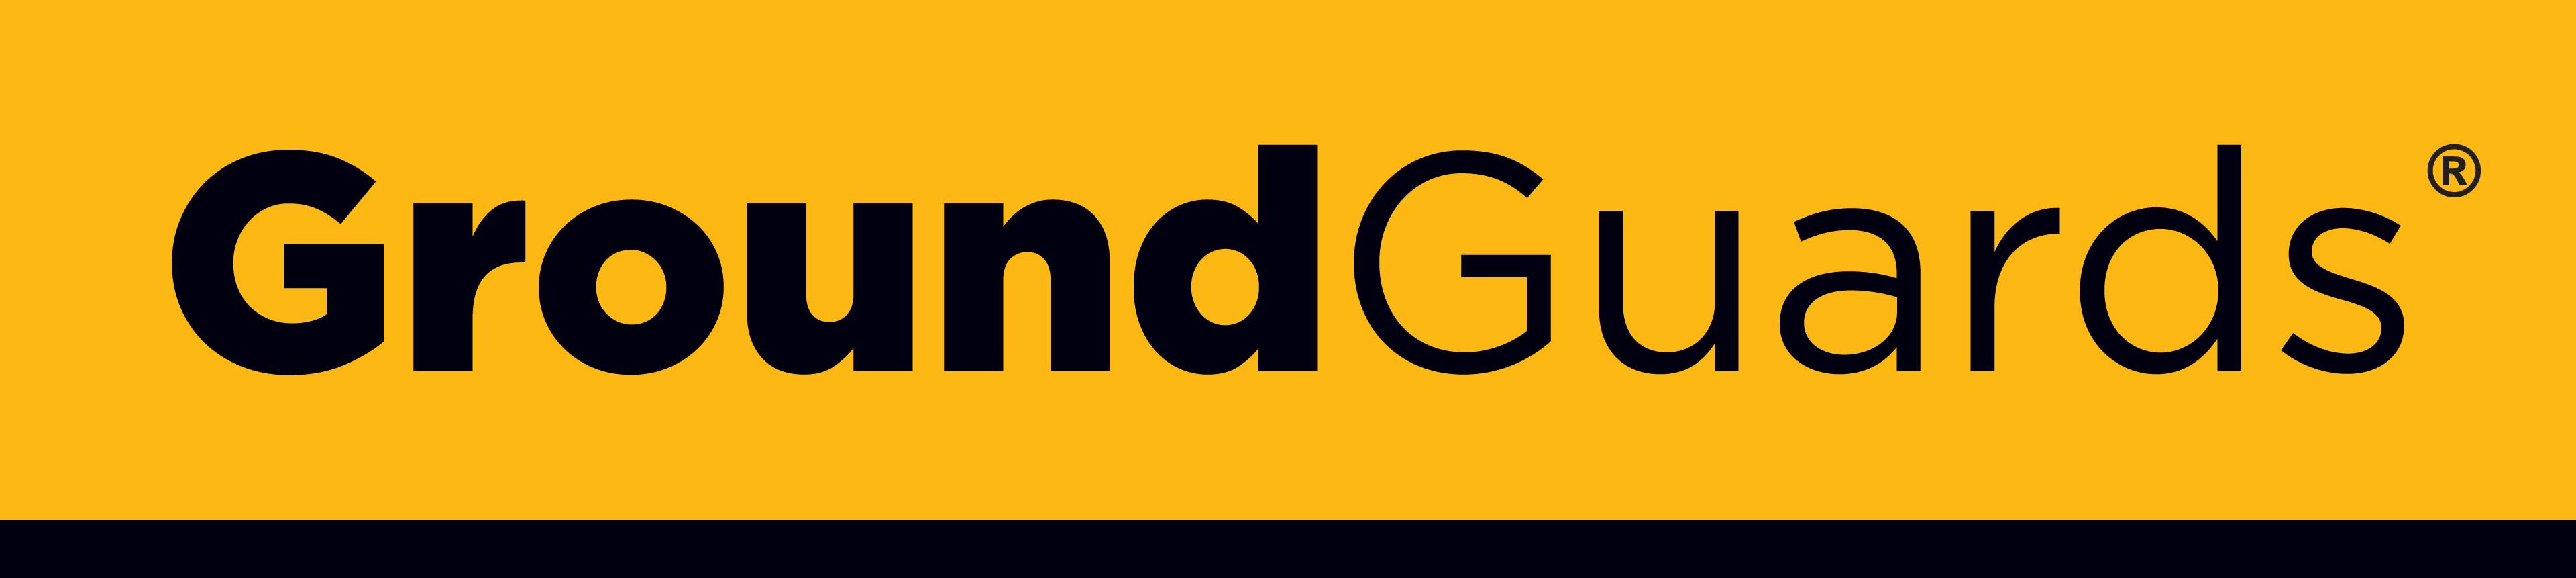 GroundGuards